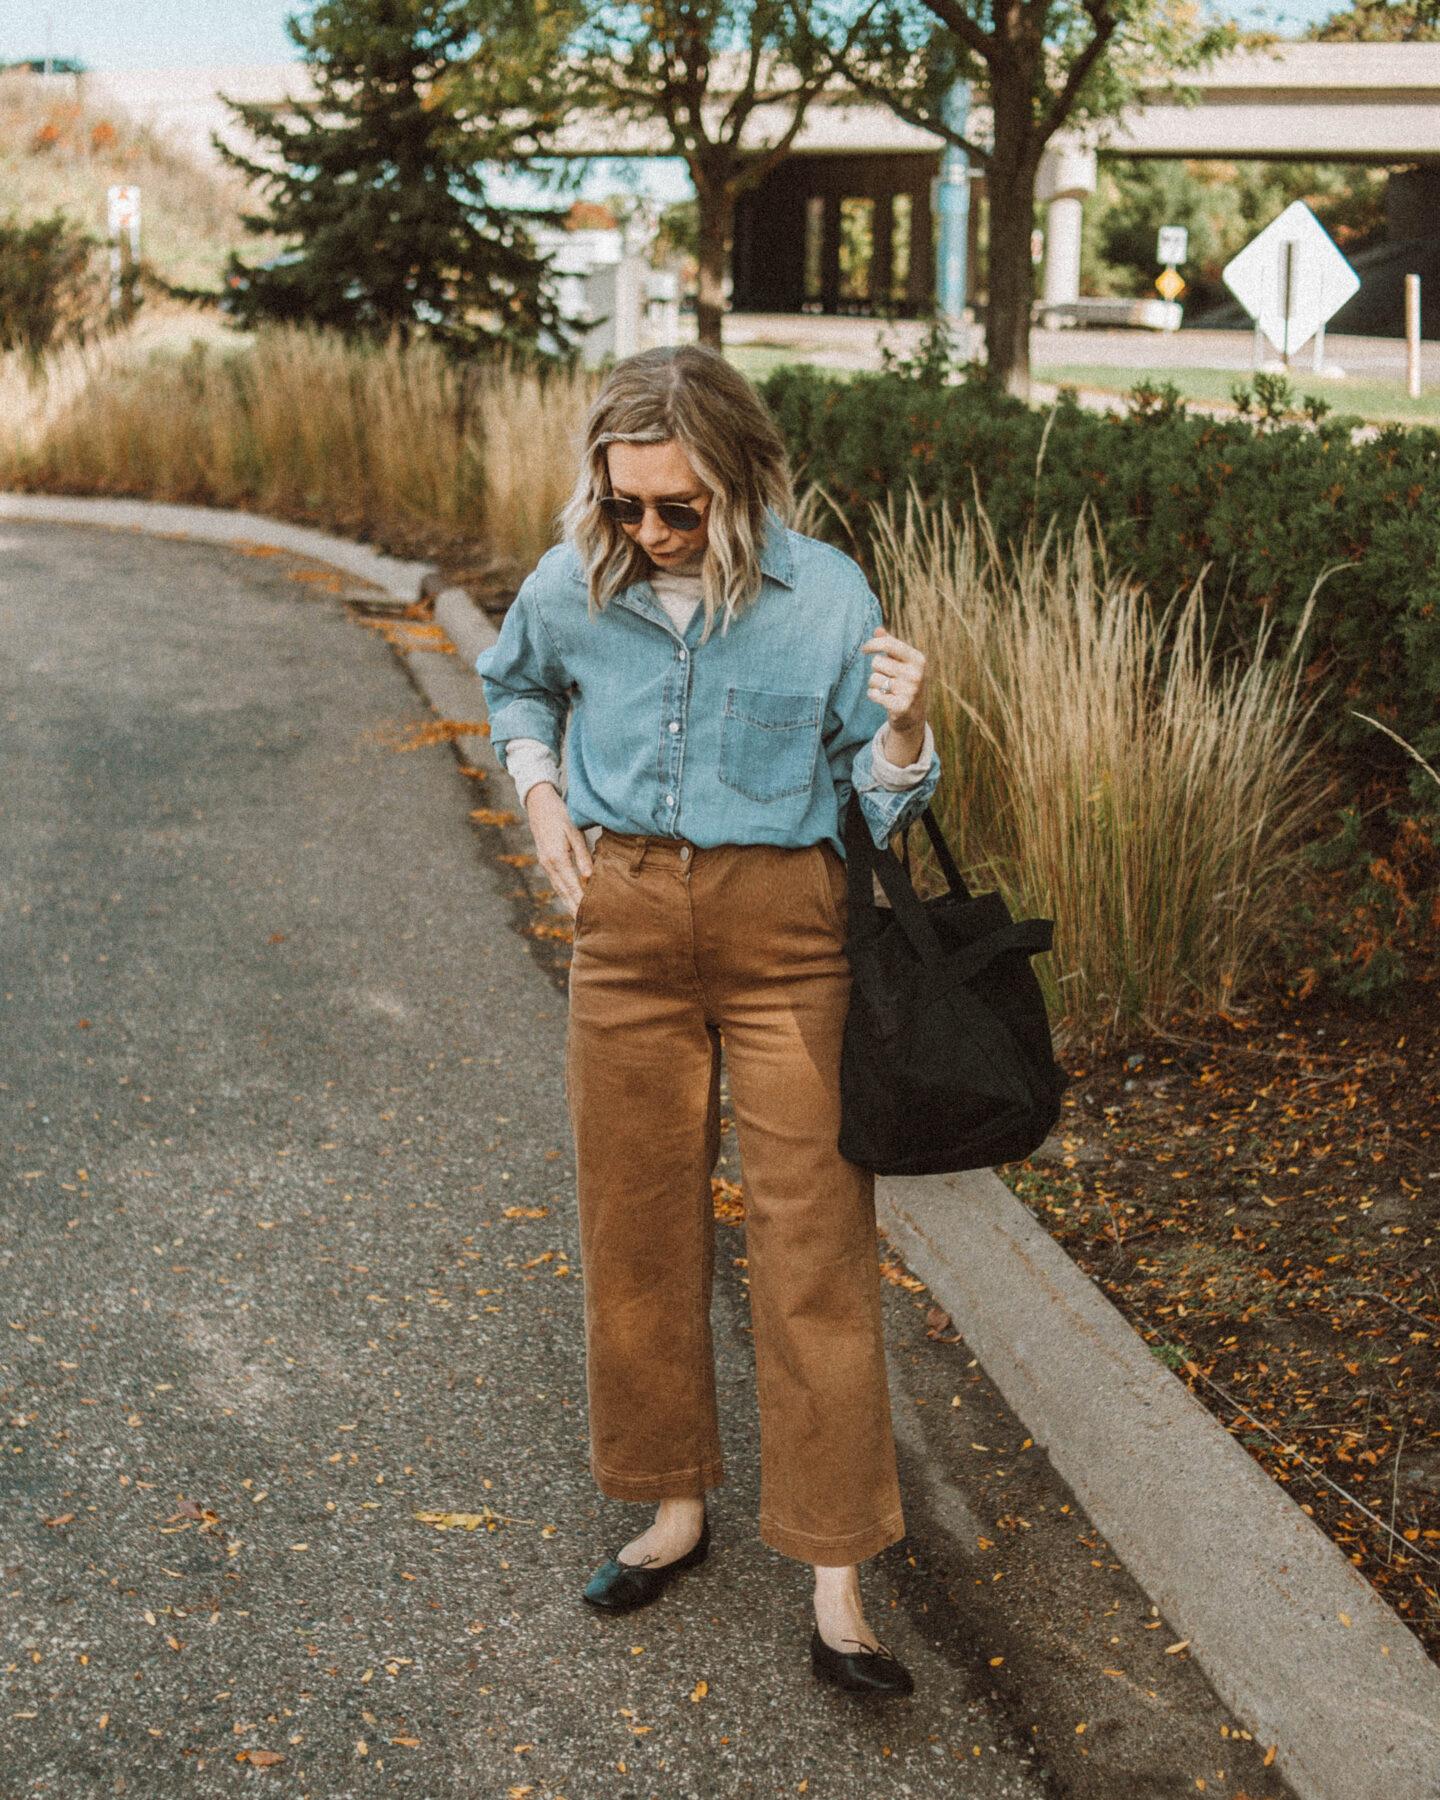 3 Ways to Wear Wide Leg Pants, Everlane Wide Leg Crop, Chambray Button Down